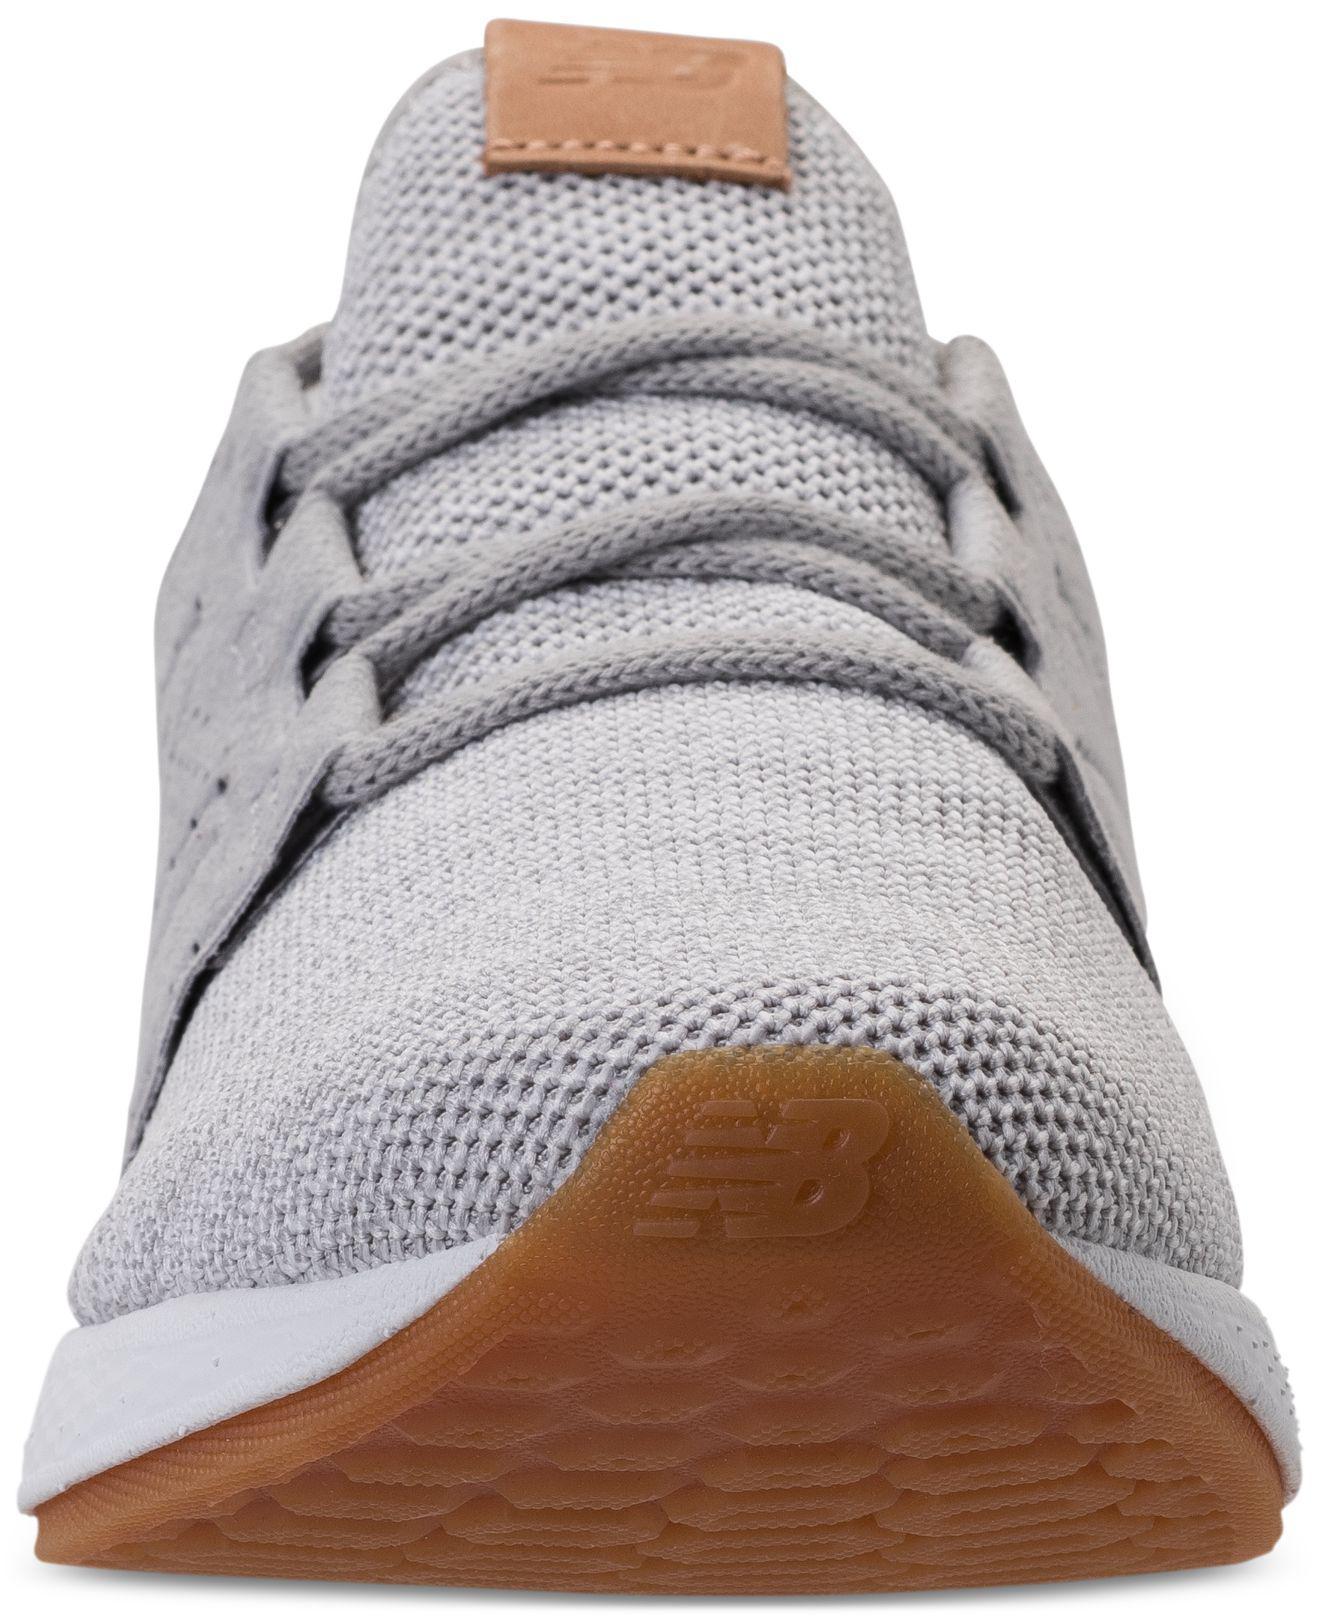 83e87b1b9 Lyst - New Balance Wide Width Fresh Foam Cruz V2 Running Sneakers ...